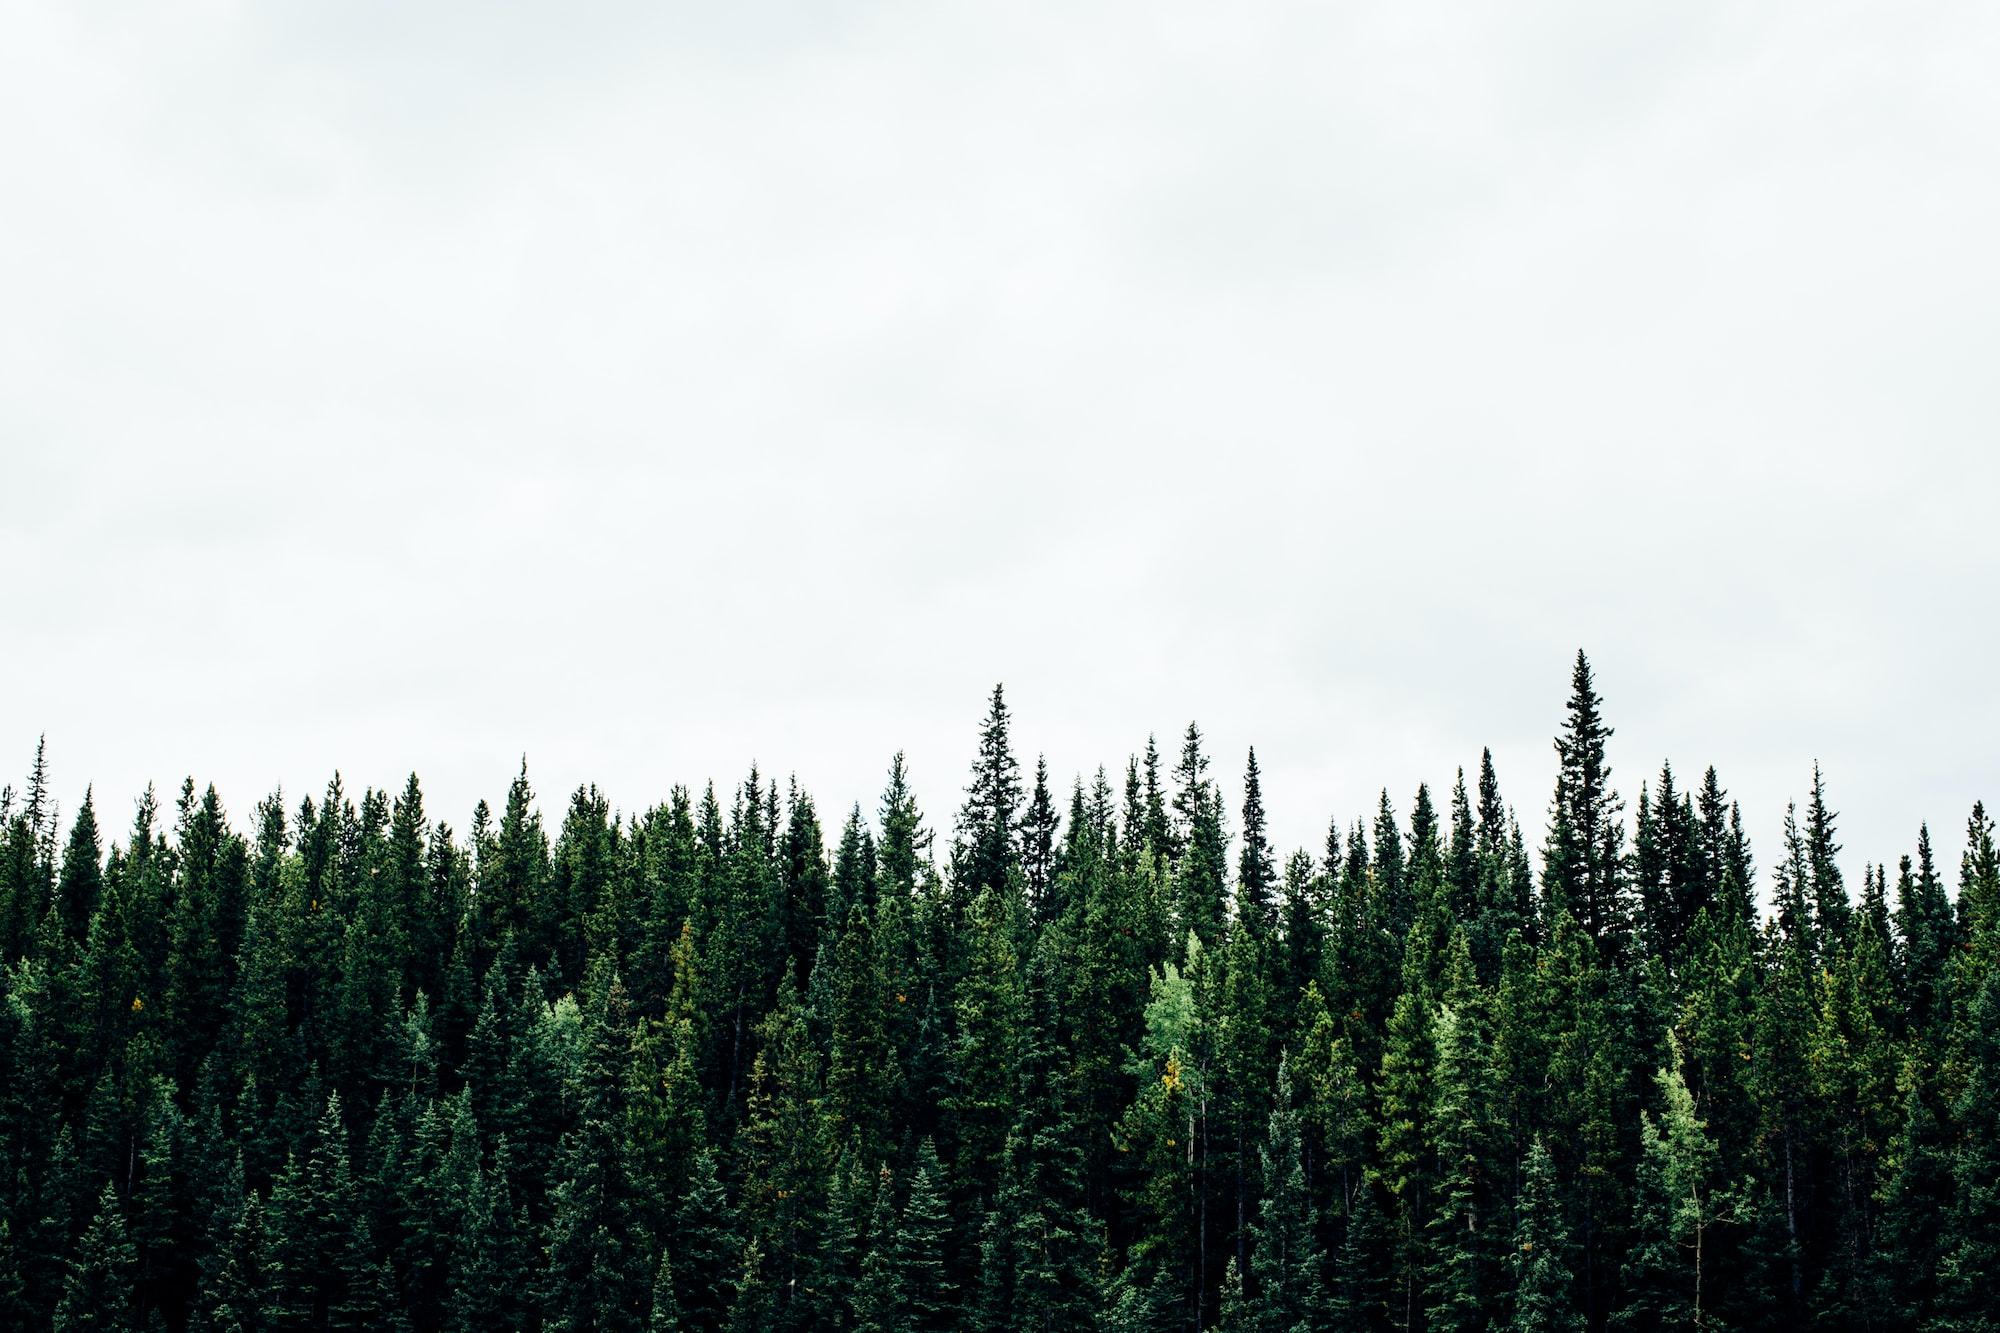 Canadian Treeline